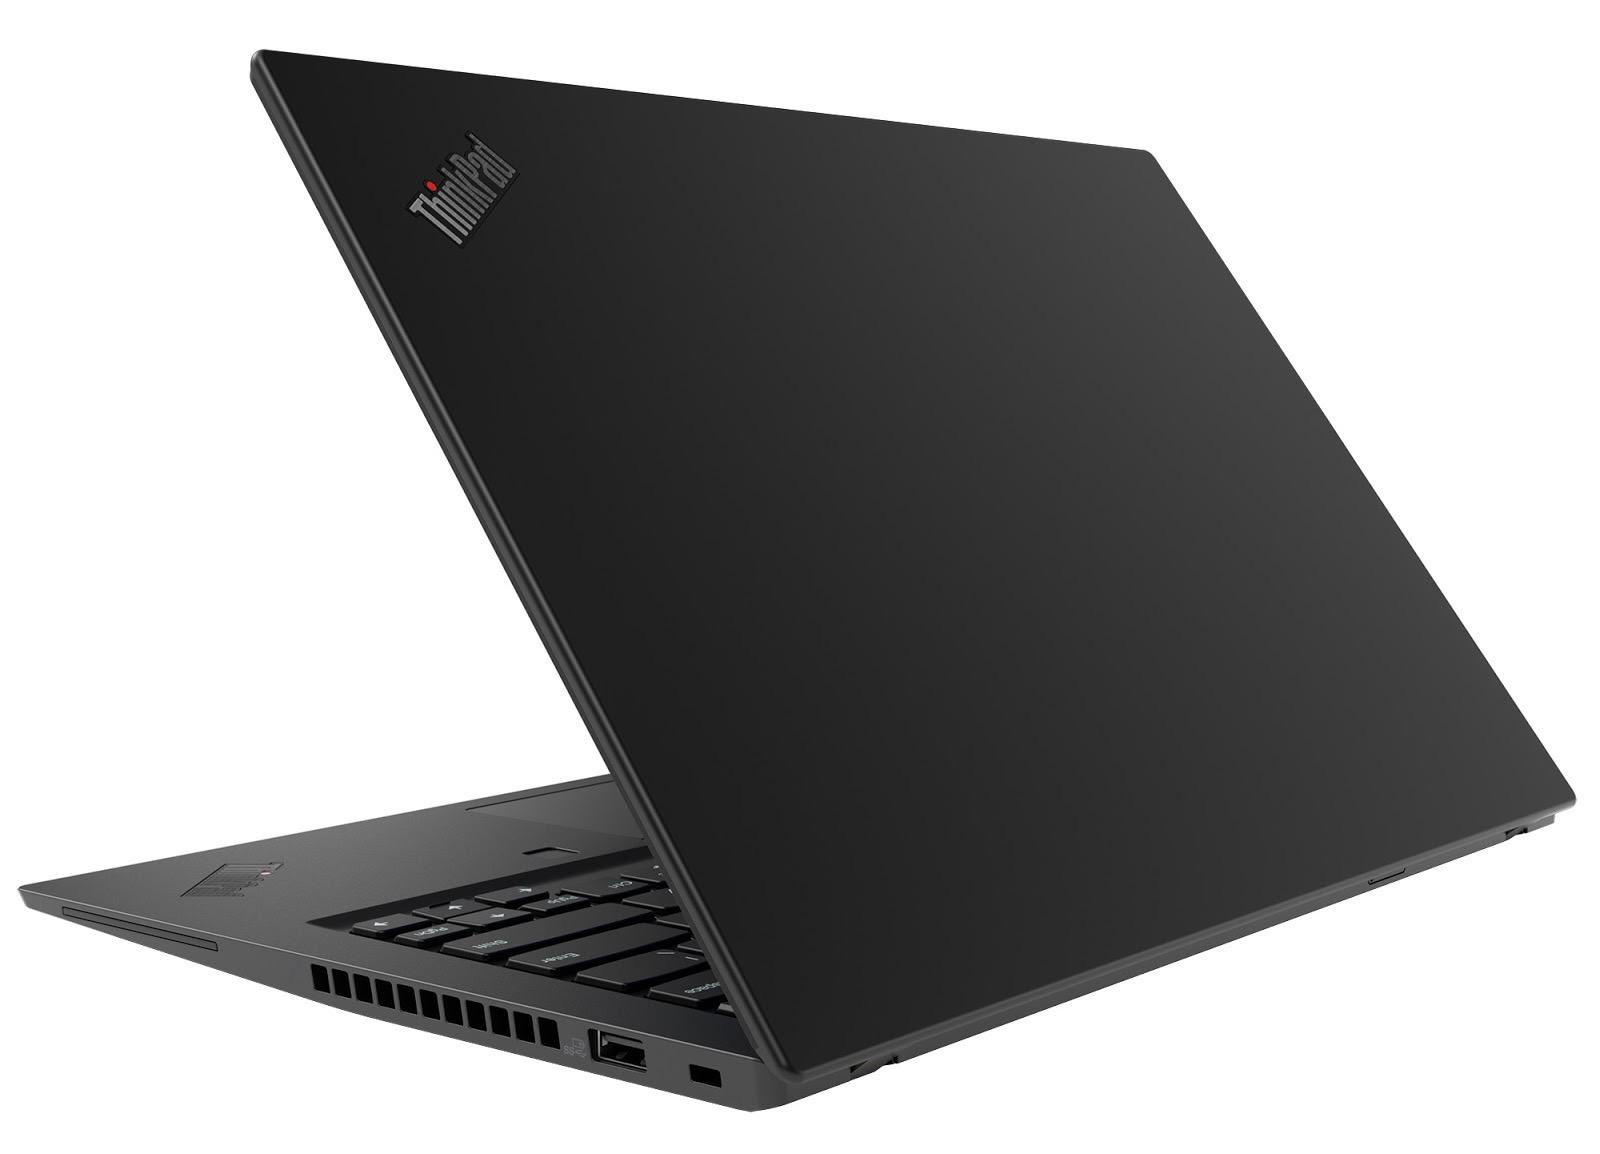 Фото 2. Ноутбук Lenovo ThinkPad T14s Gen 1 Black (20T00016RT)